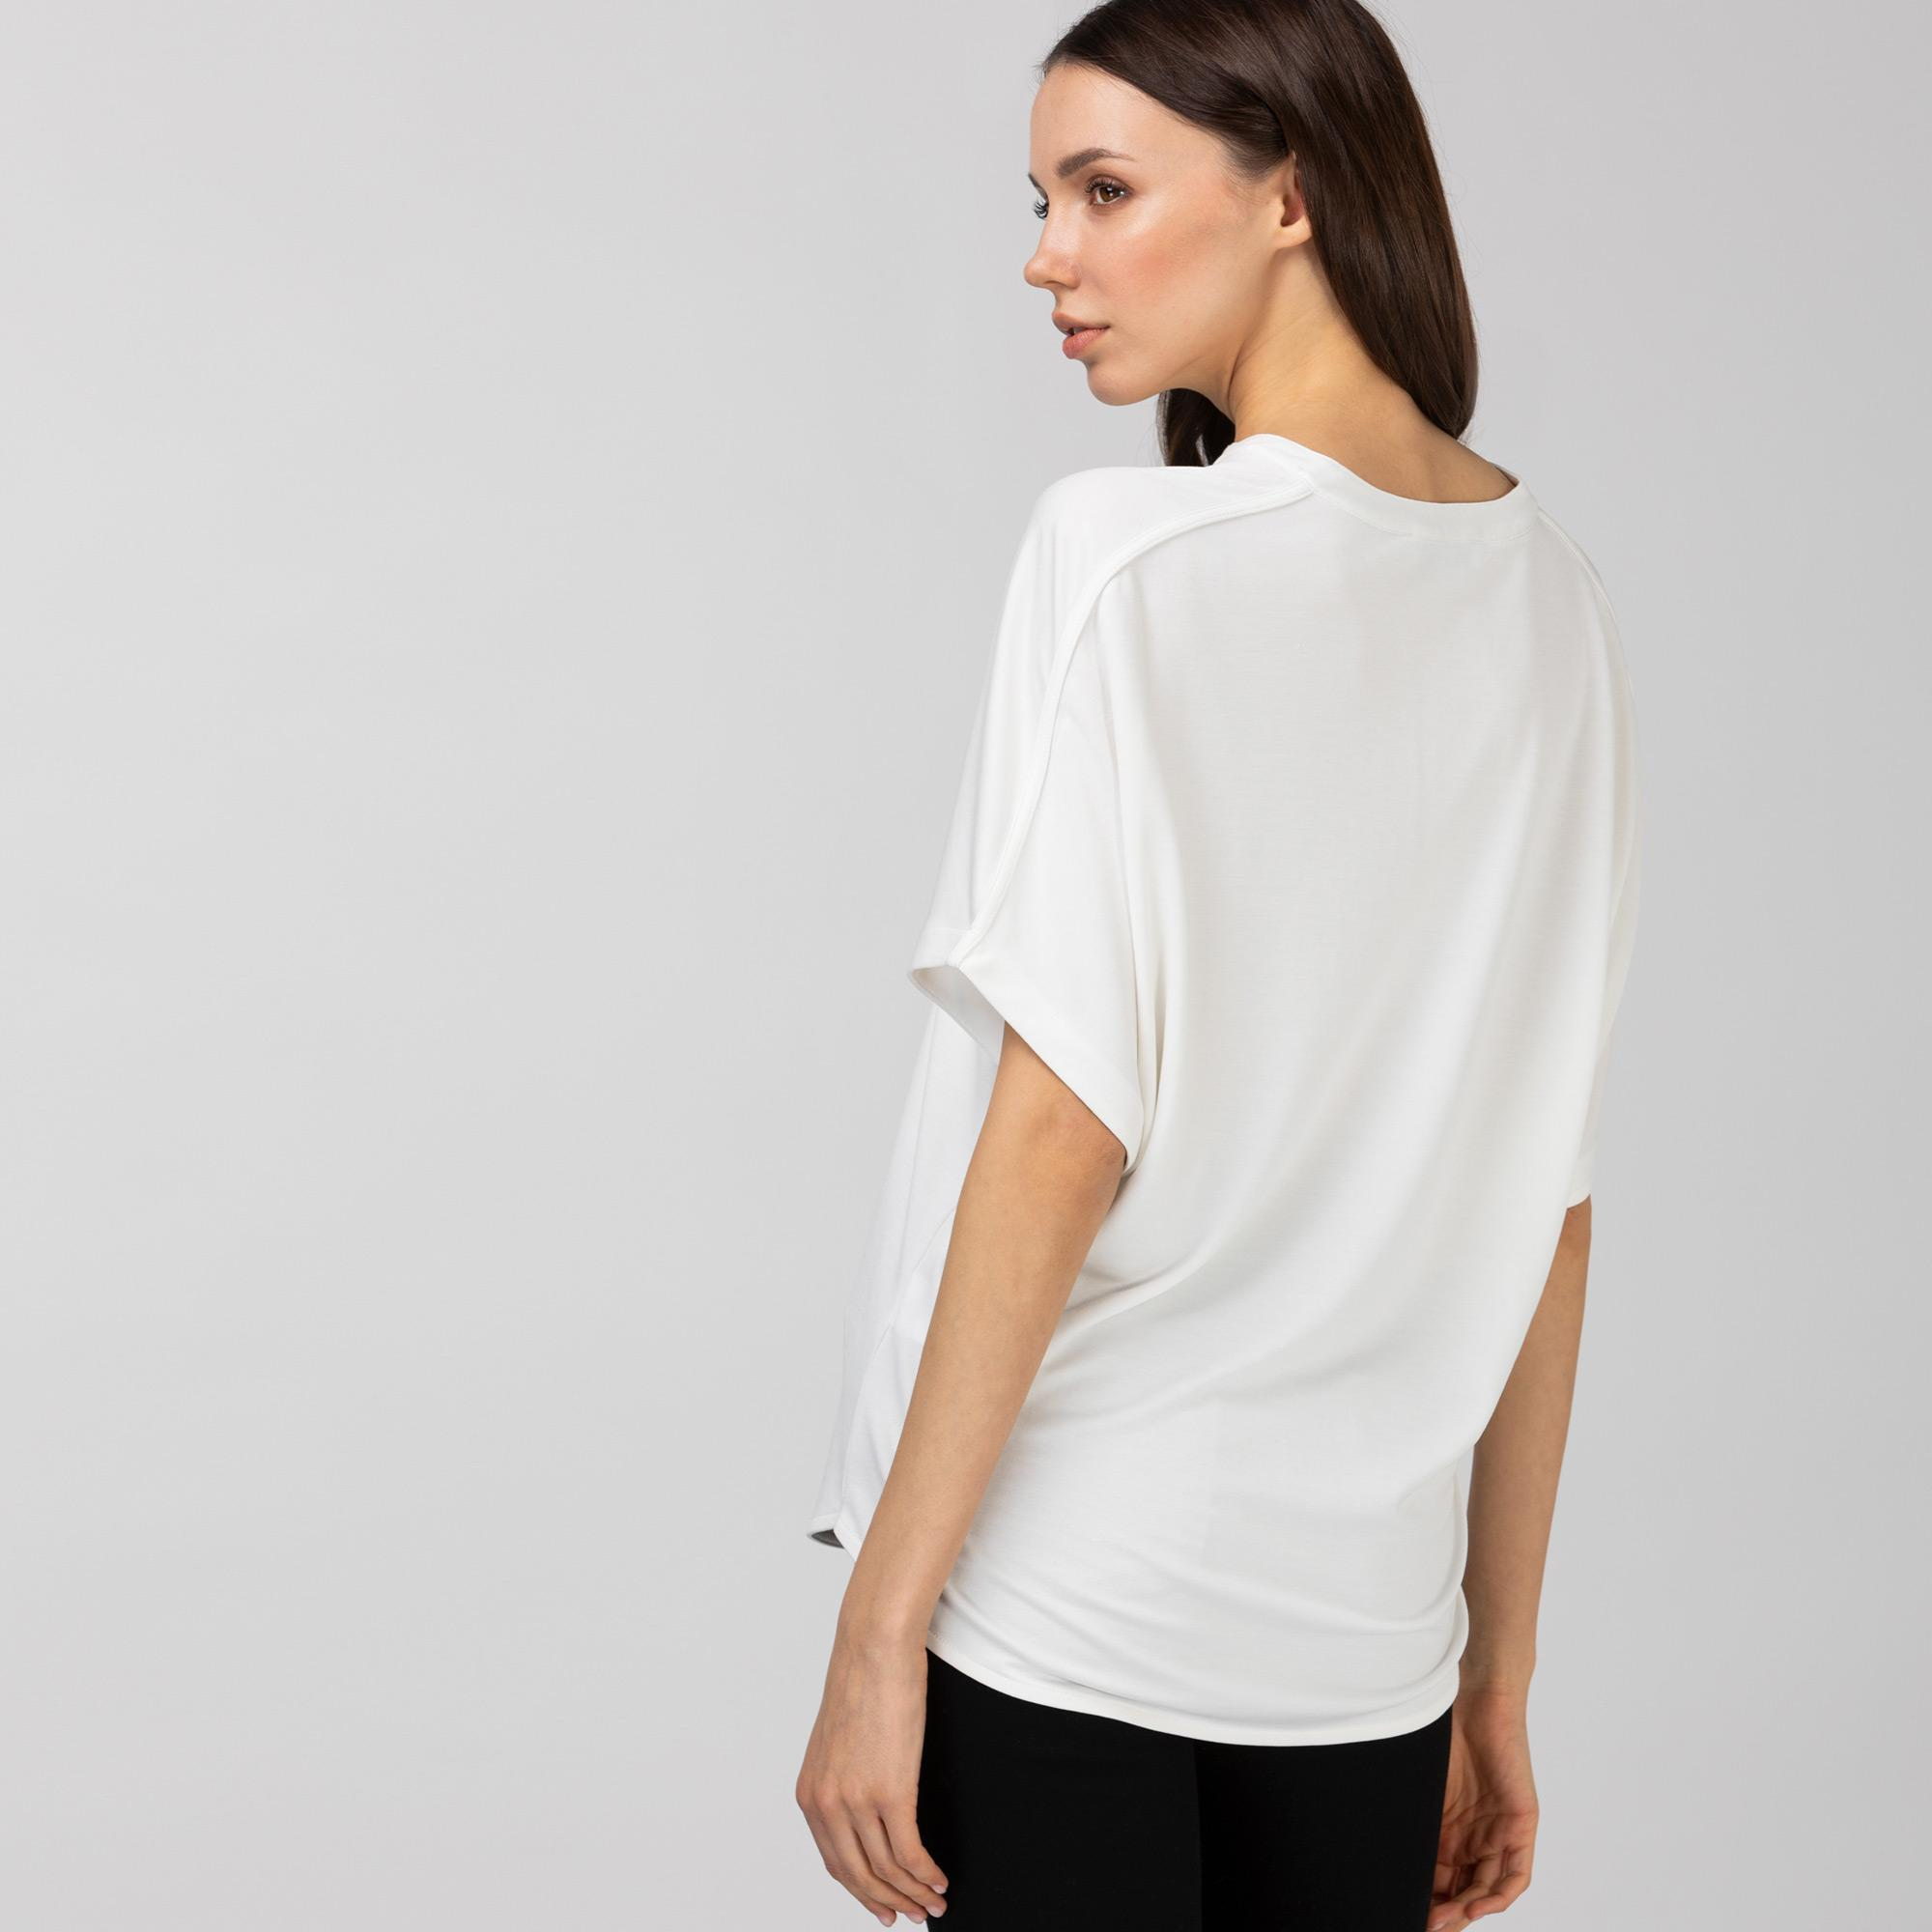 Lacoste Kadın Loose Fit V Yaka Beyaz T-Shirt